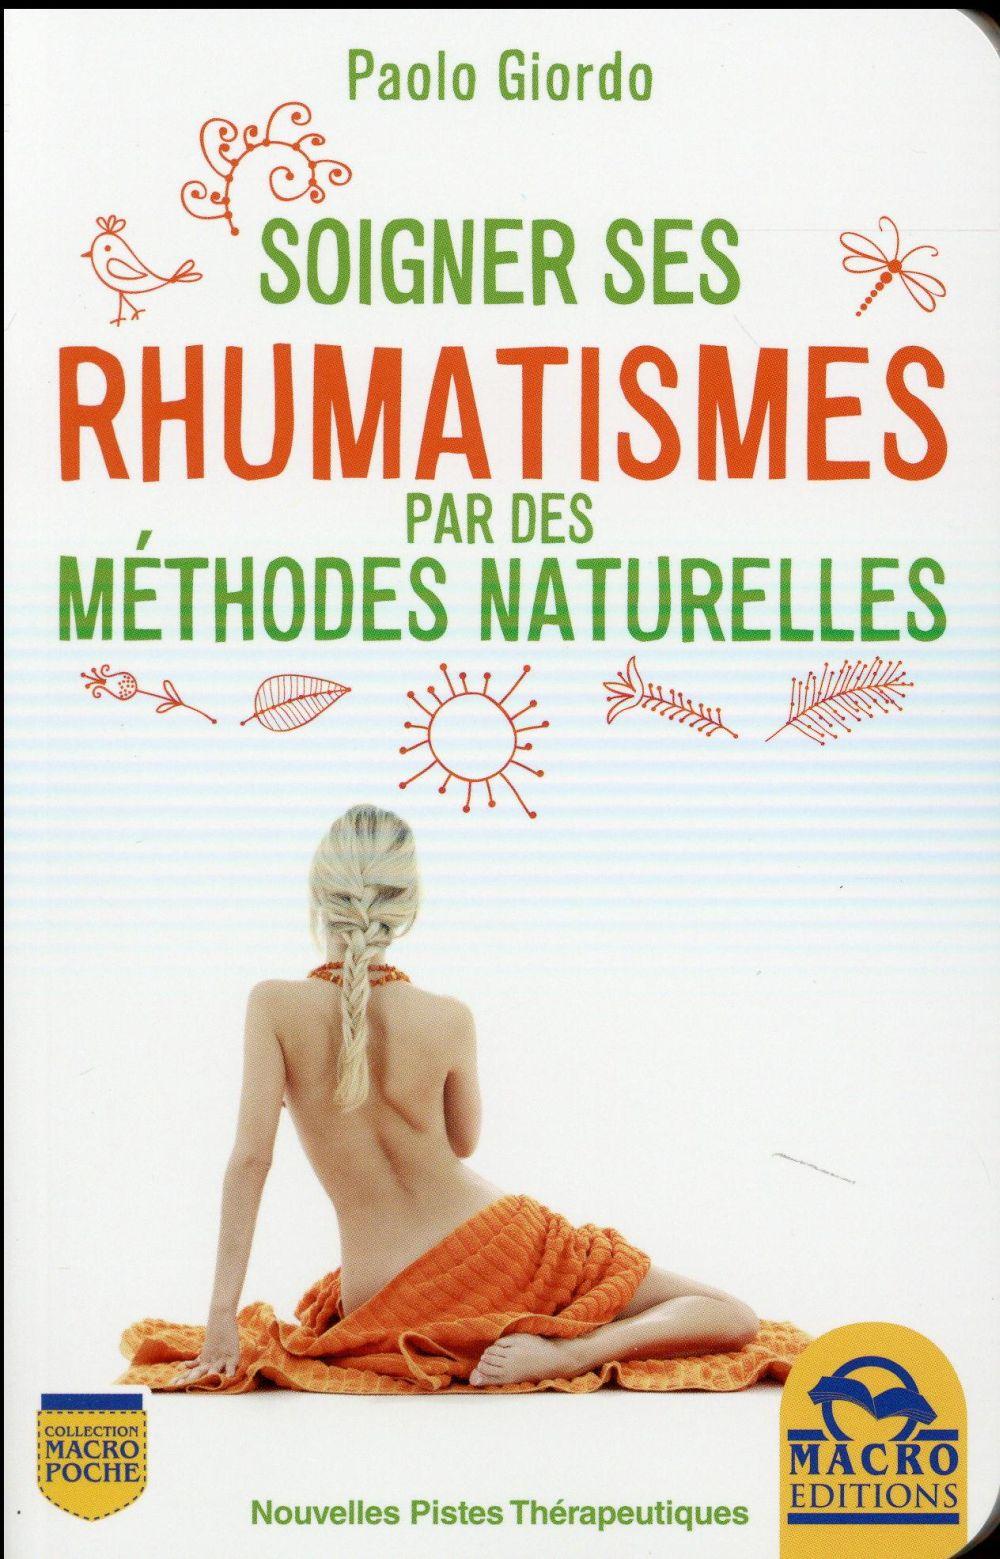 SOIGNER SES RHUMATISMES PAR DES METHODES NATURELLES